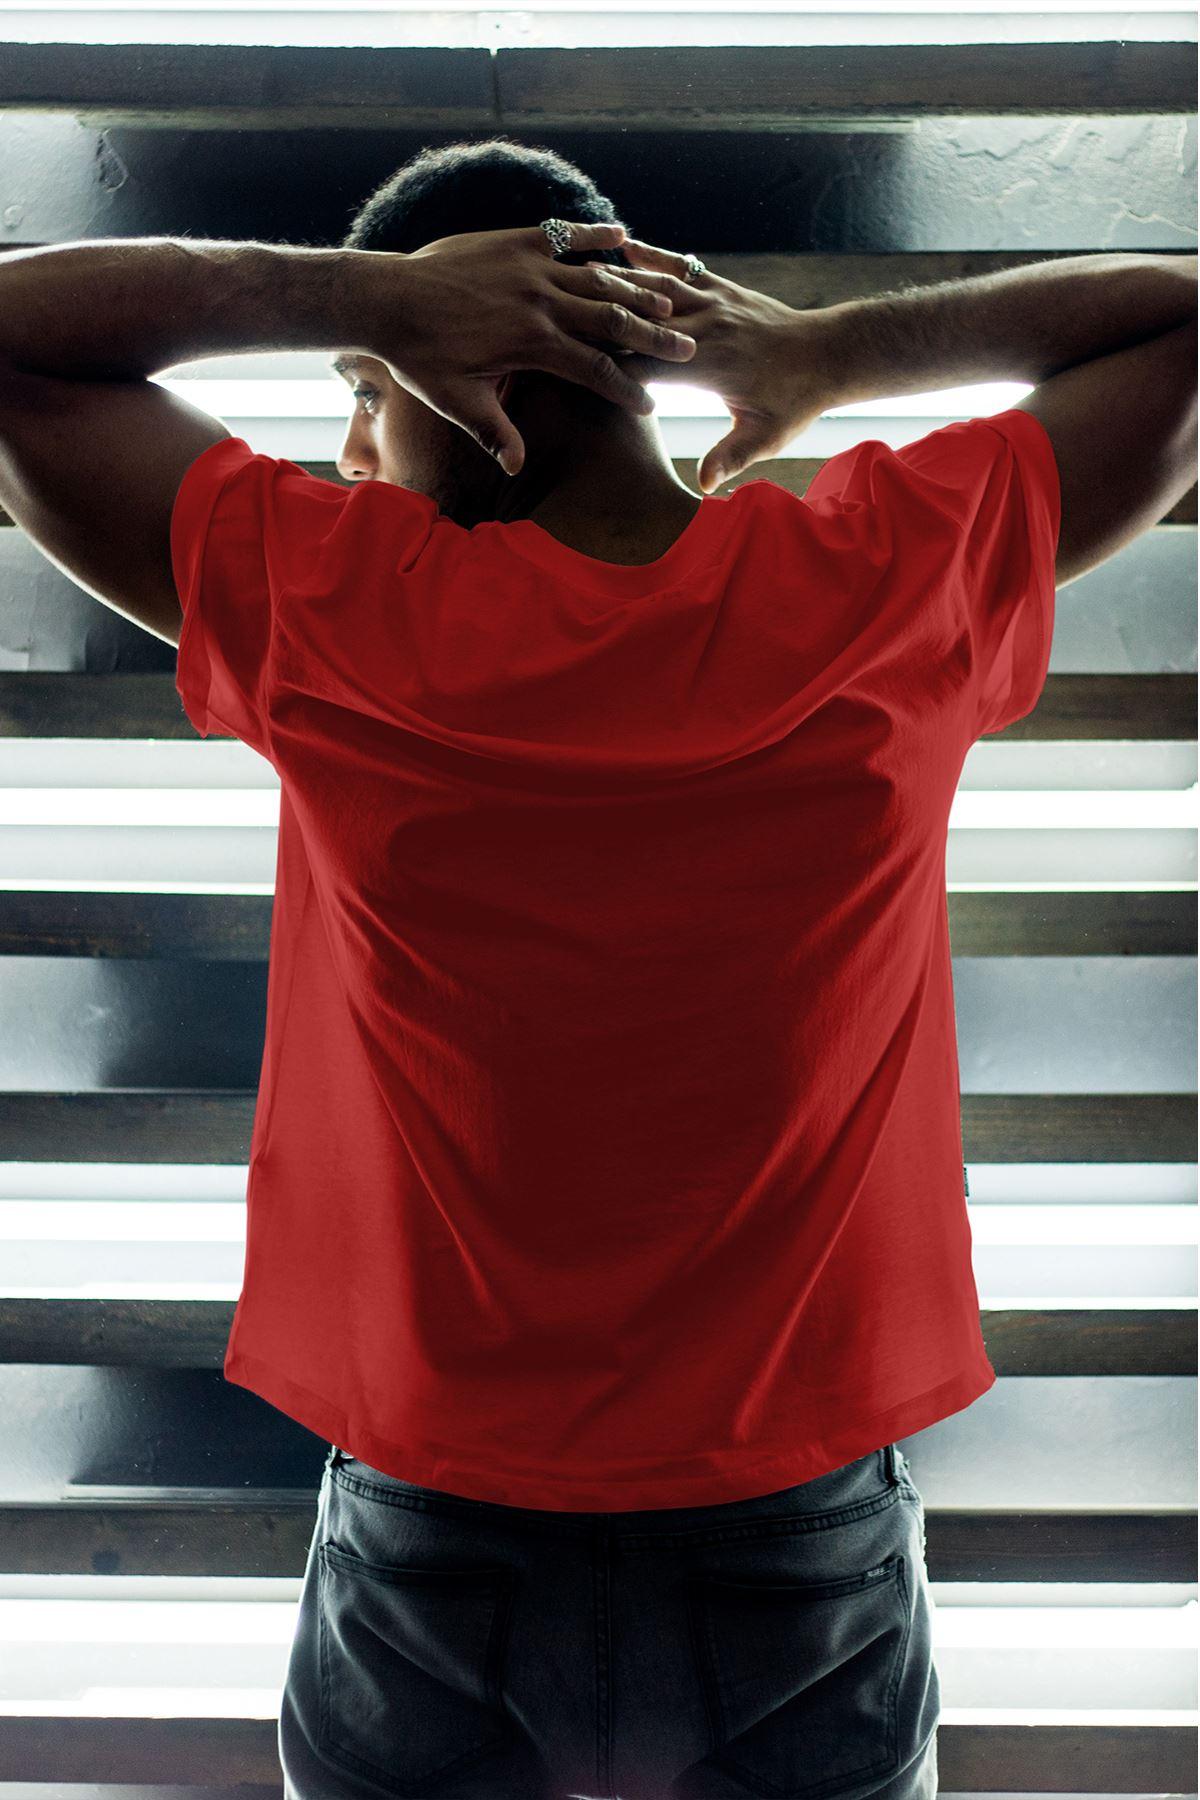 Harry Potter 02 Kırmızı Erkek Oversize Tshirt - Tişört